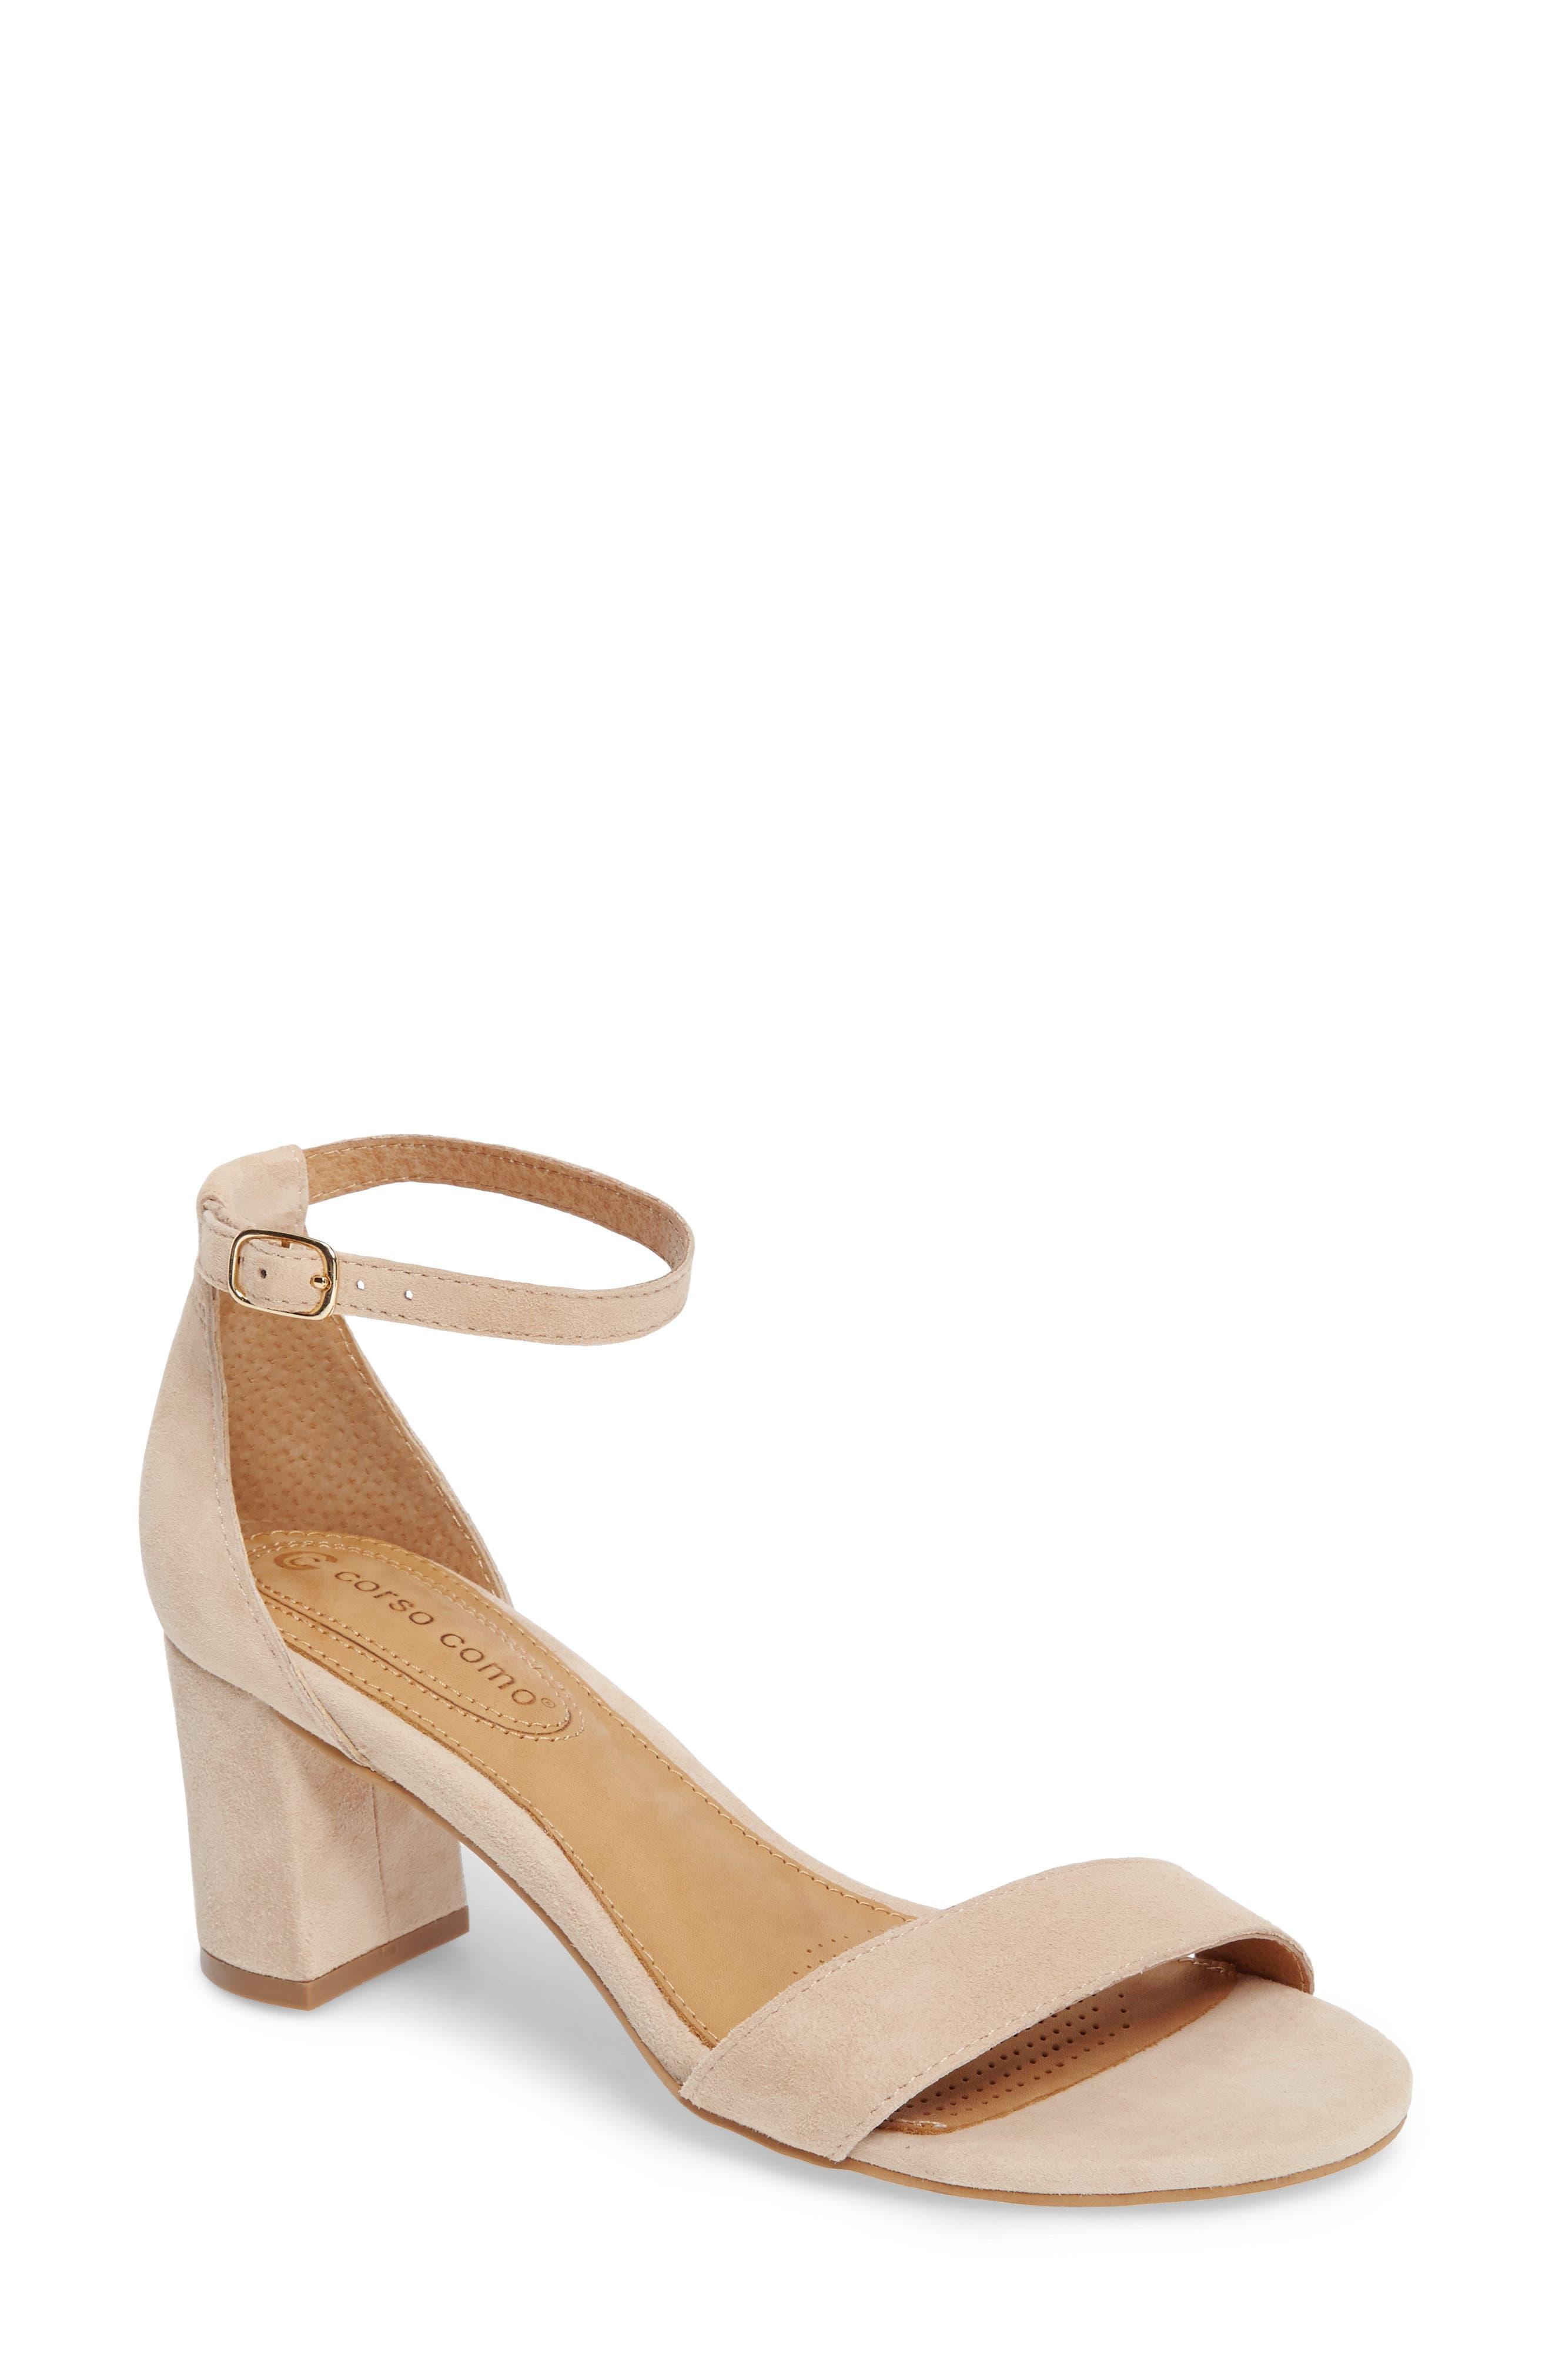 Main Image - Corso Como Caress Sandal (Women)